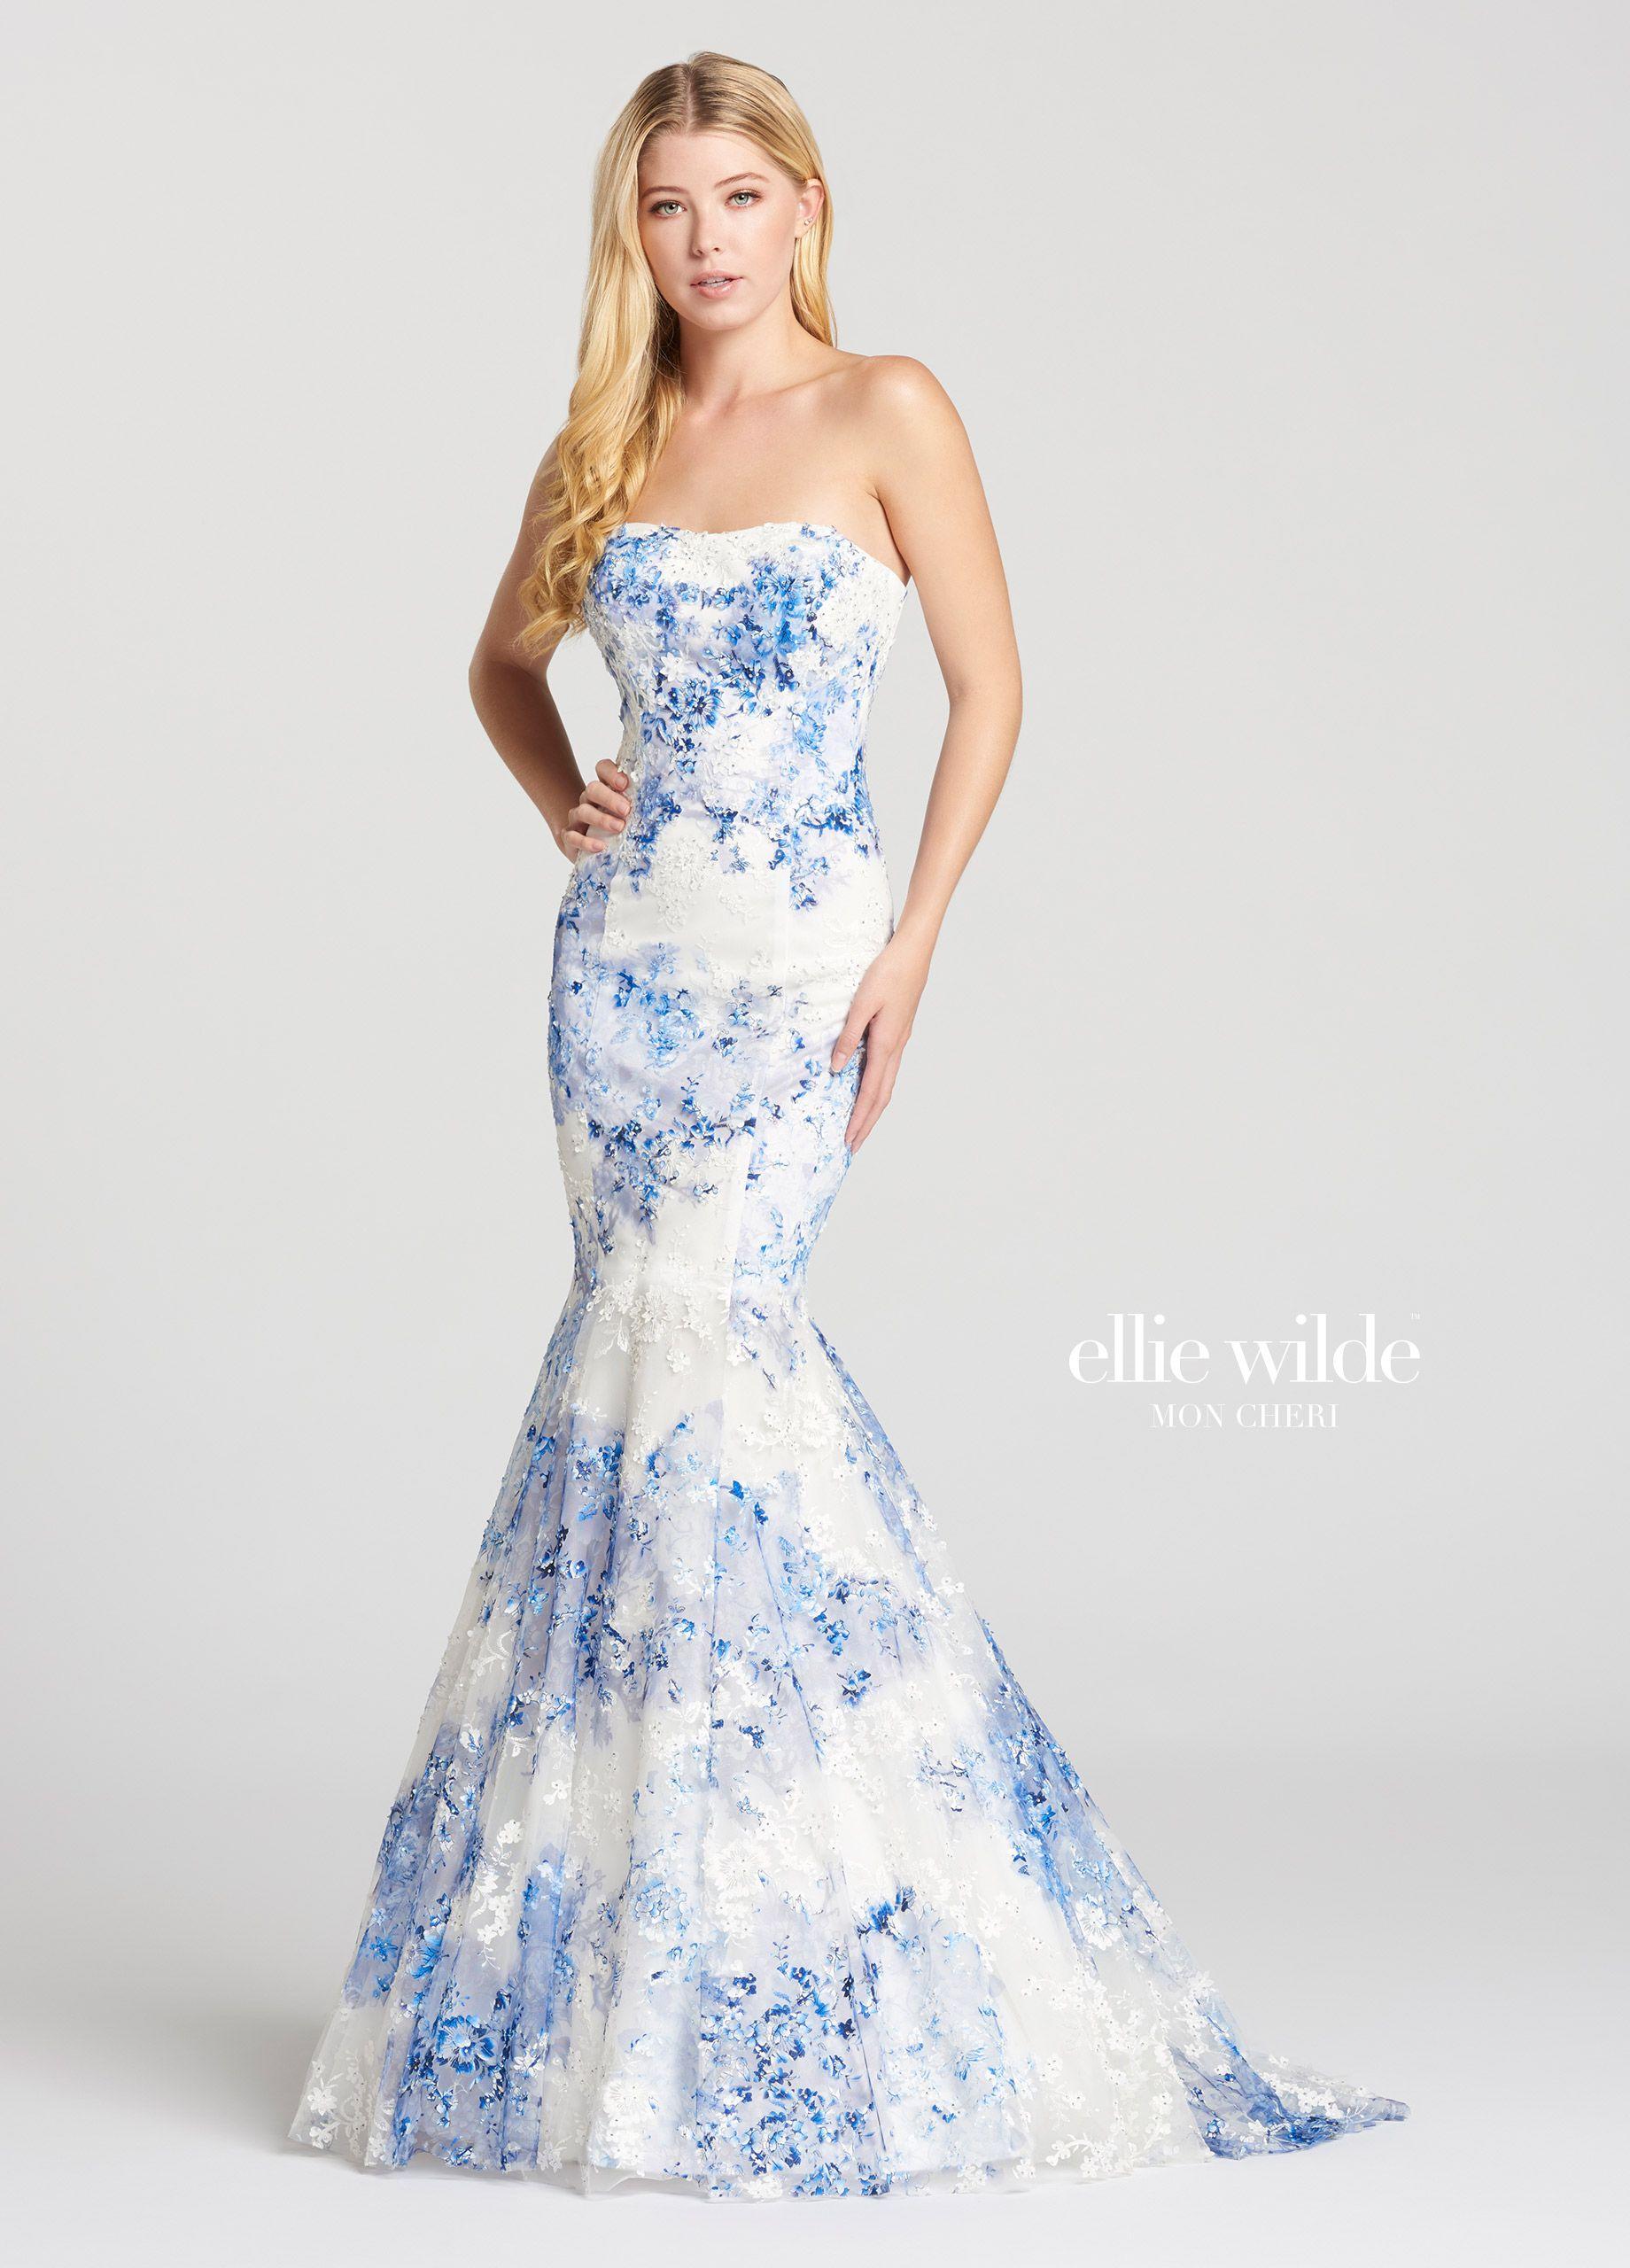 faff0e5f2ec Strapless Novelty Allover Lace Trumpet Prom Dress- EW118111 ...